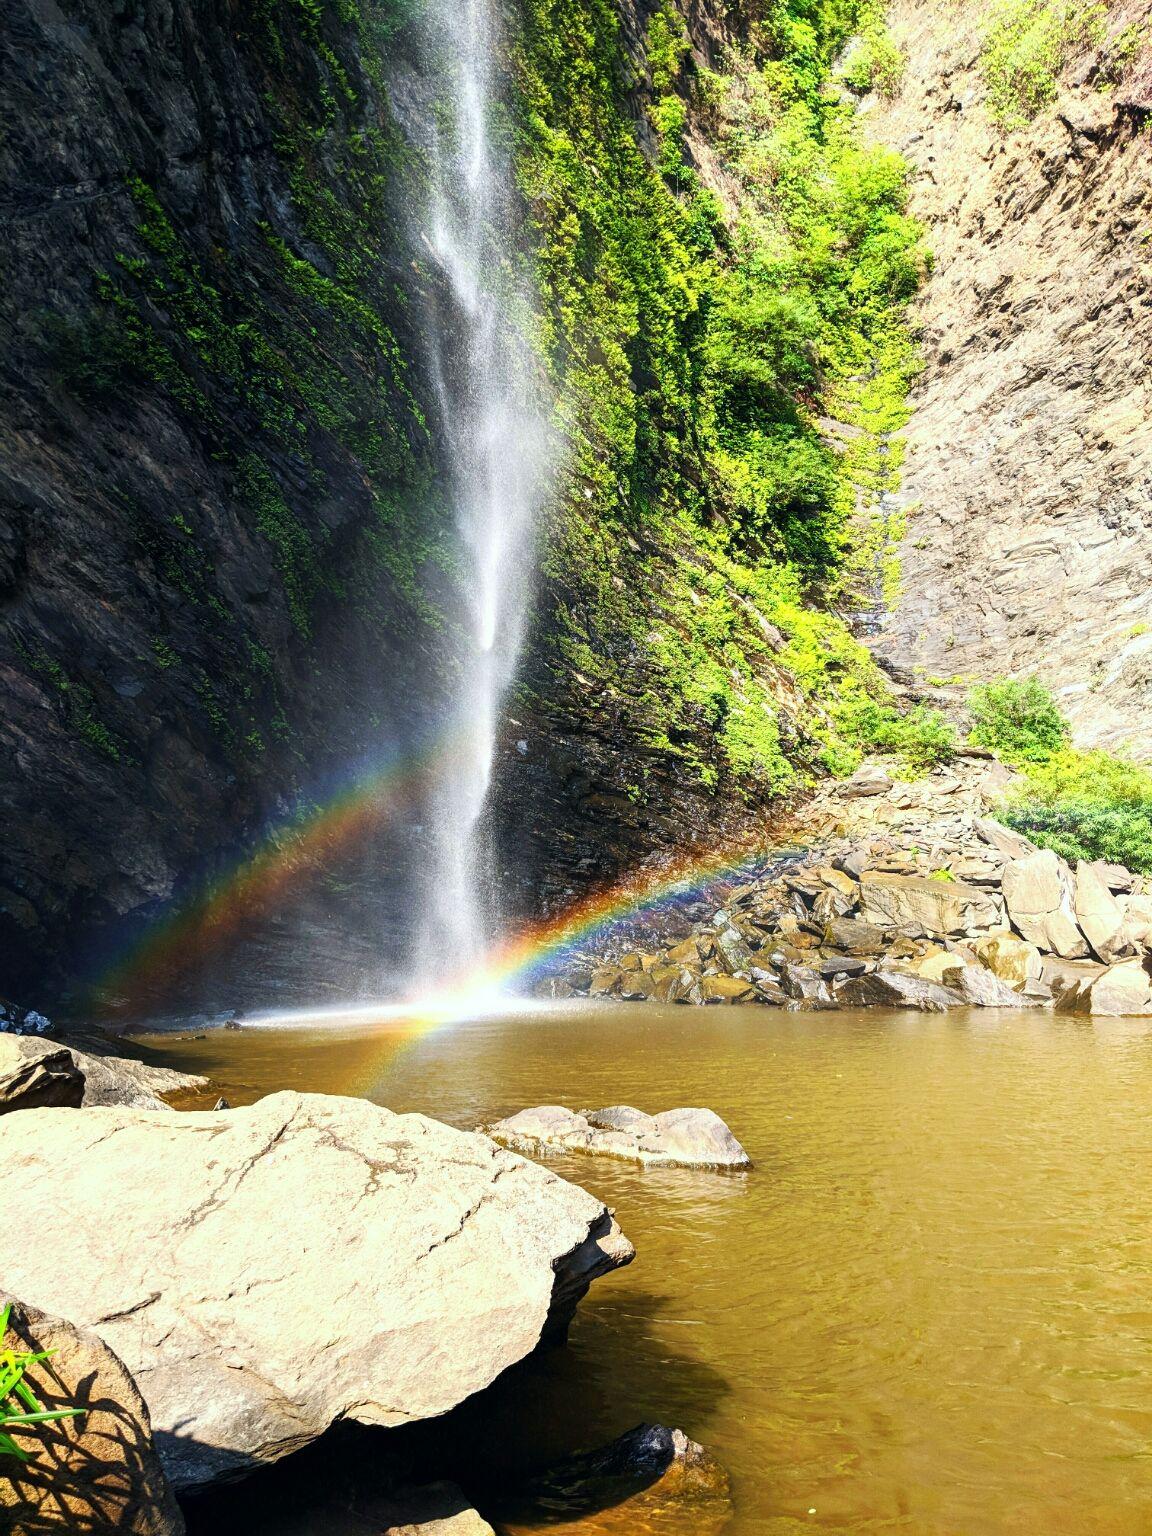 Photo of Koodlu Waterfall By Shikhar Leo